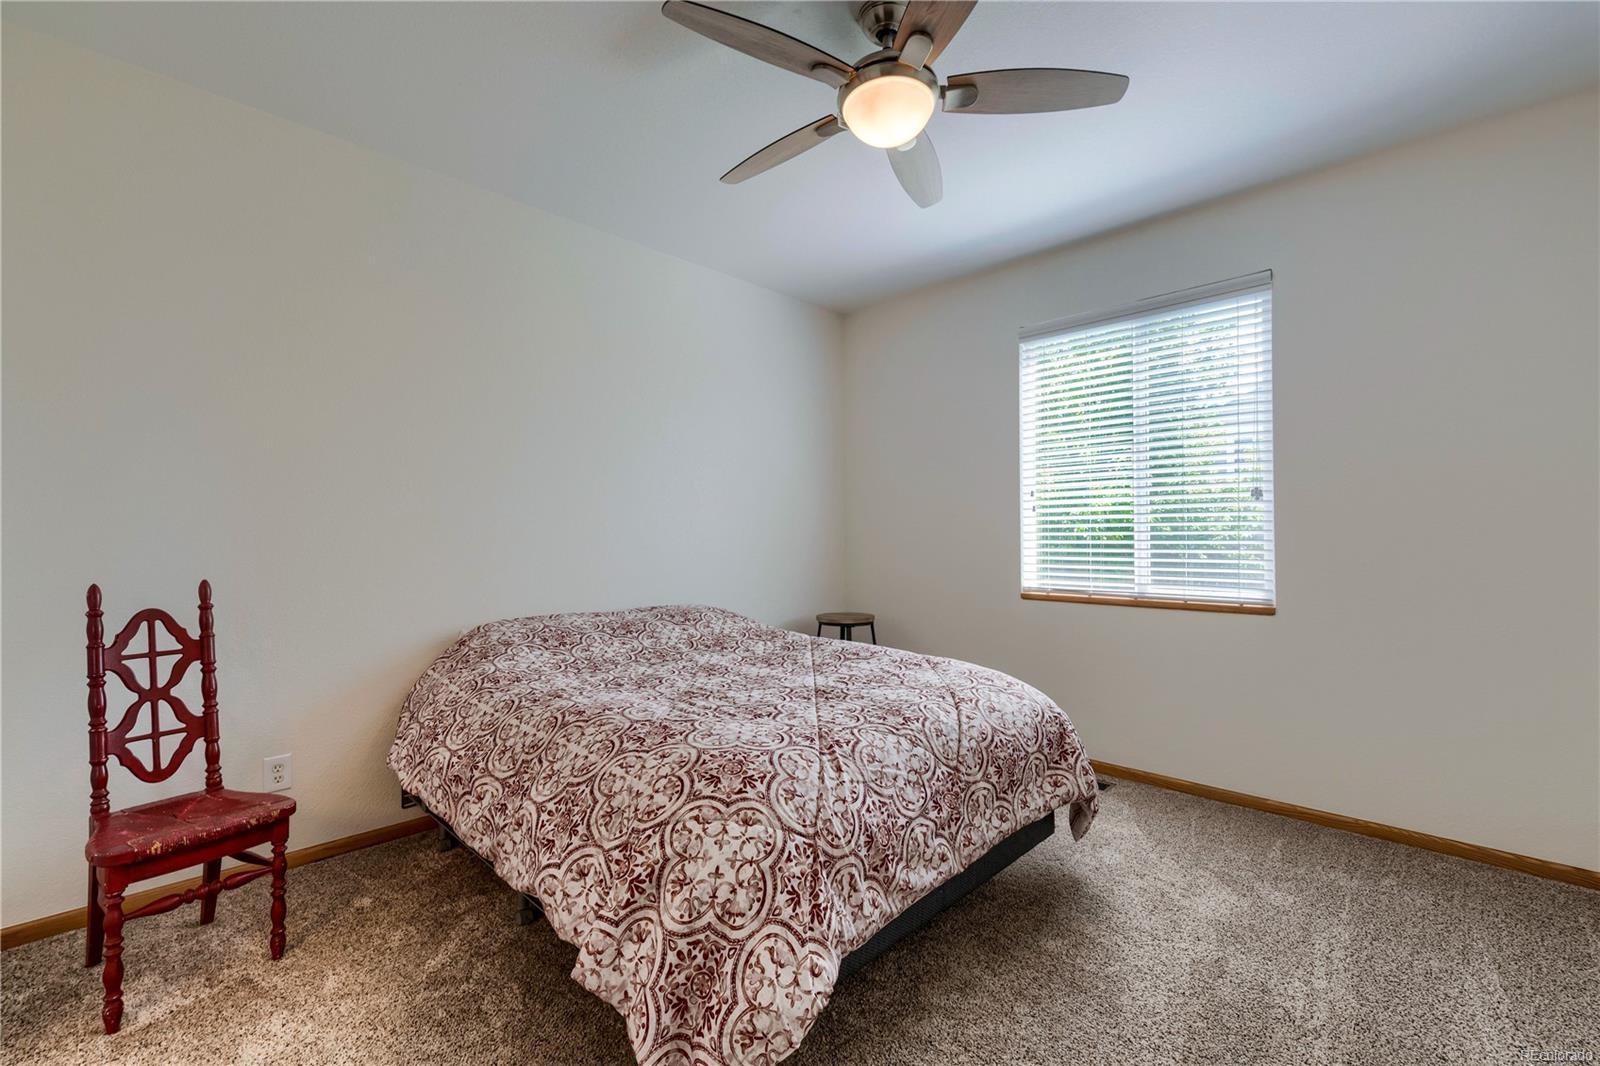 MLS# 1817675 - 1 - 984  S Lilac Court, Milliken, CO 80543